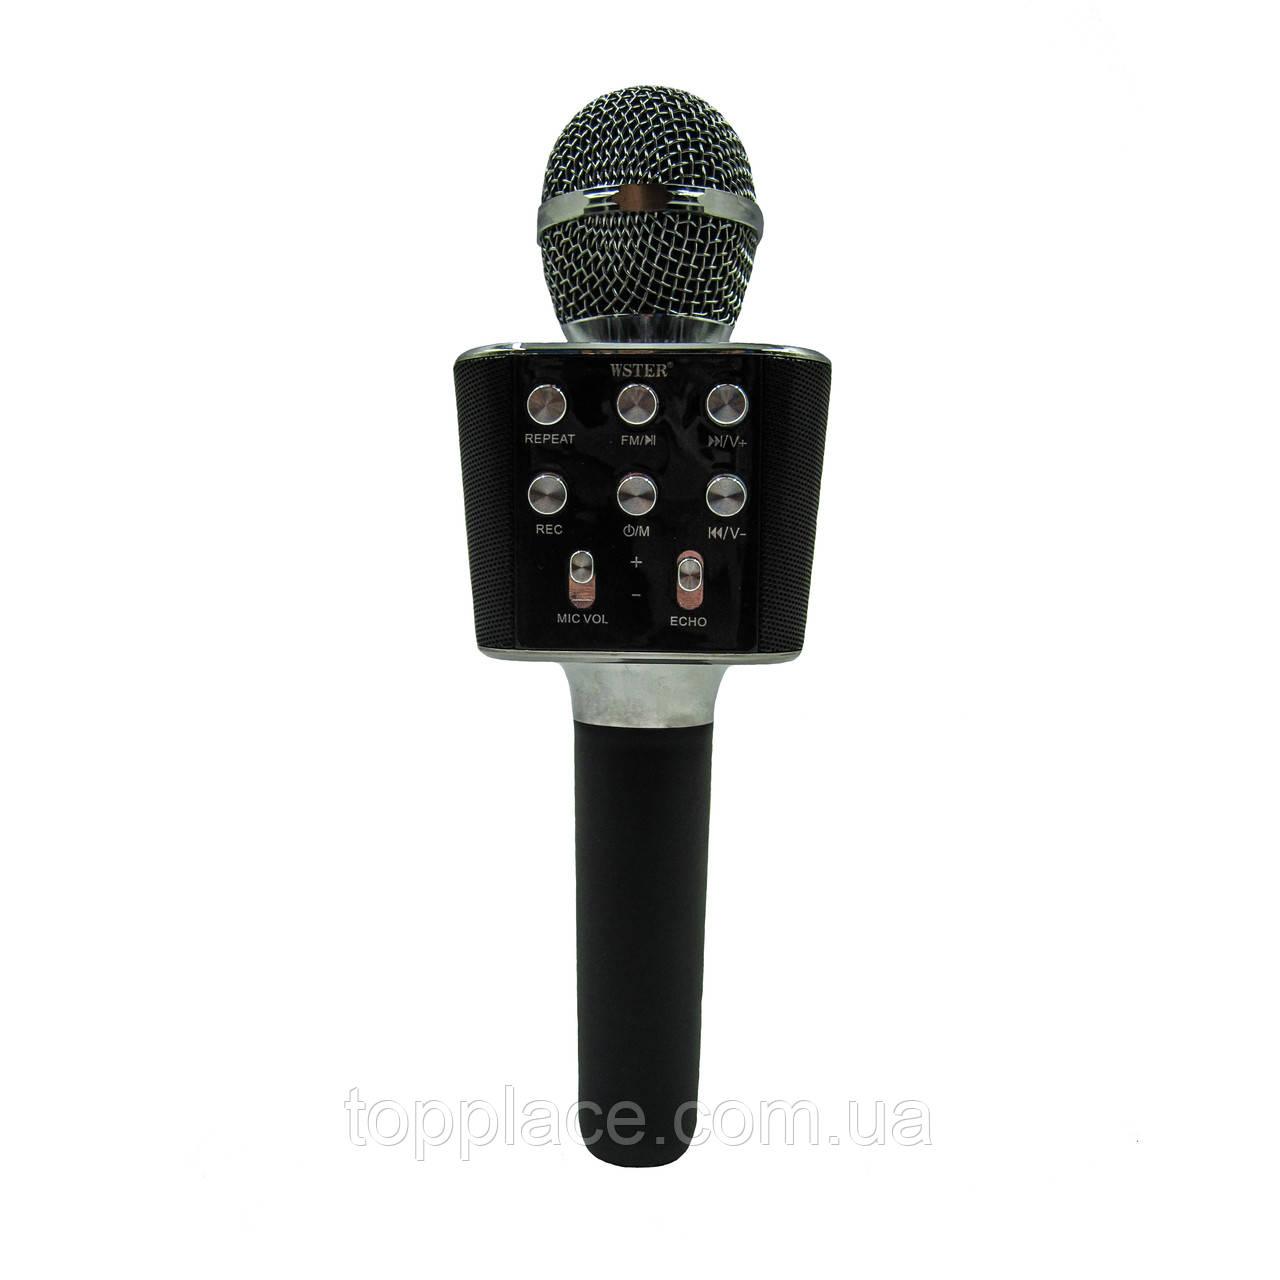 Беспроводной Bluetooth караоке микрофон WSTER WS-1688 Black (G101001168)